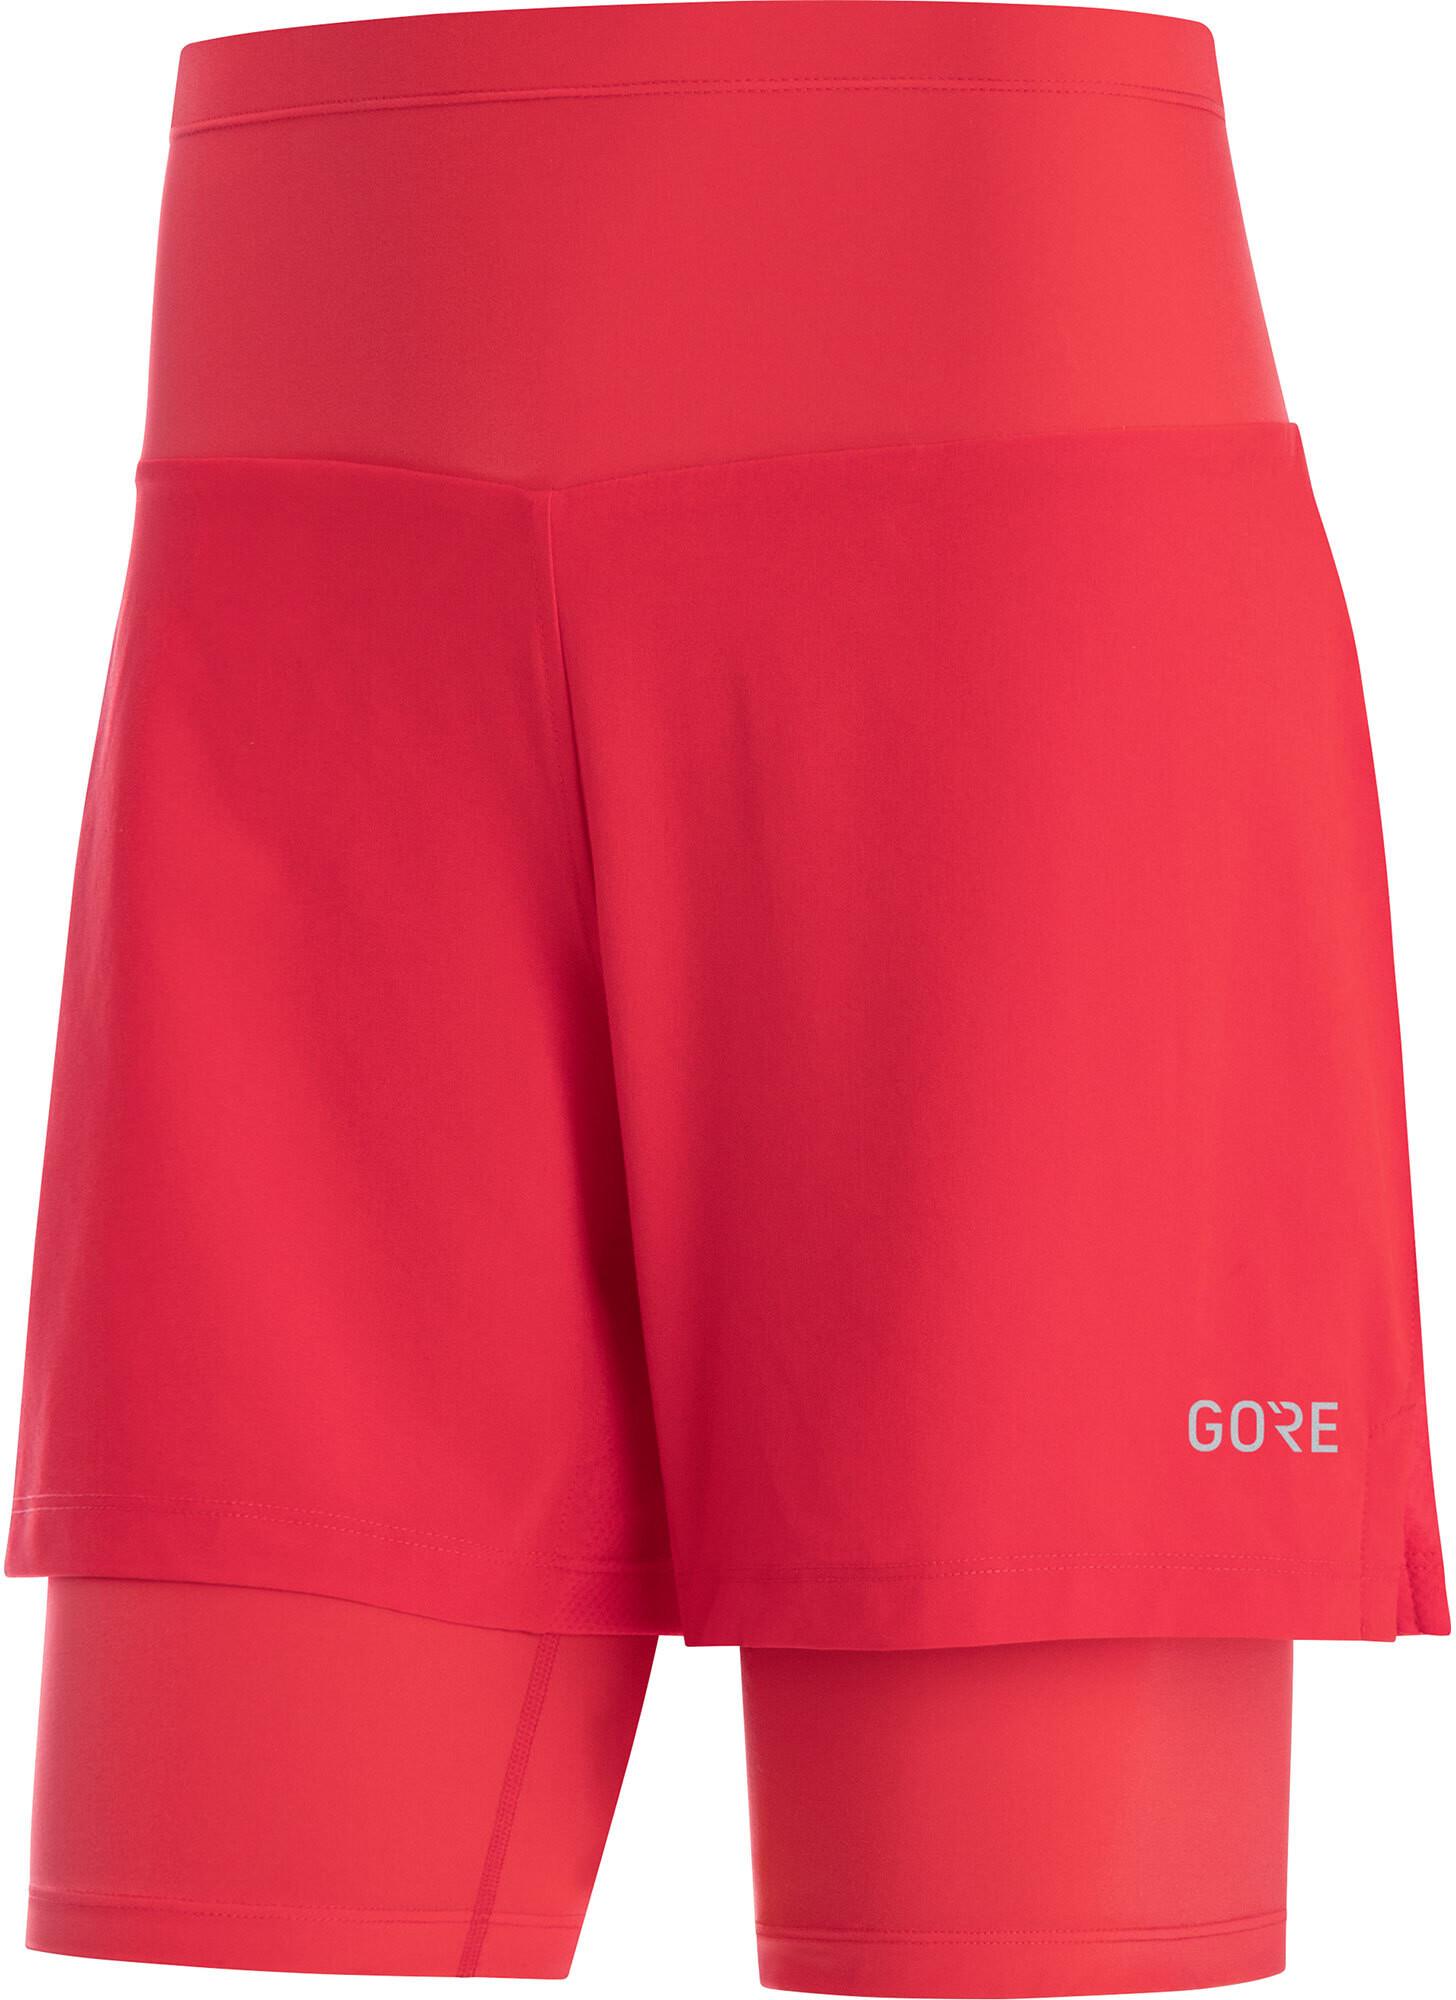 Adidas TERREX Swift R GTX sko Dame Core Sort Pink Tactile :